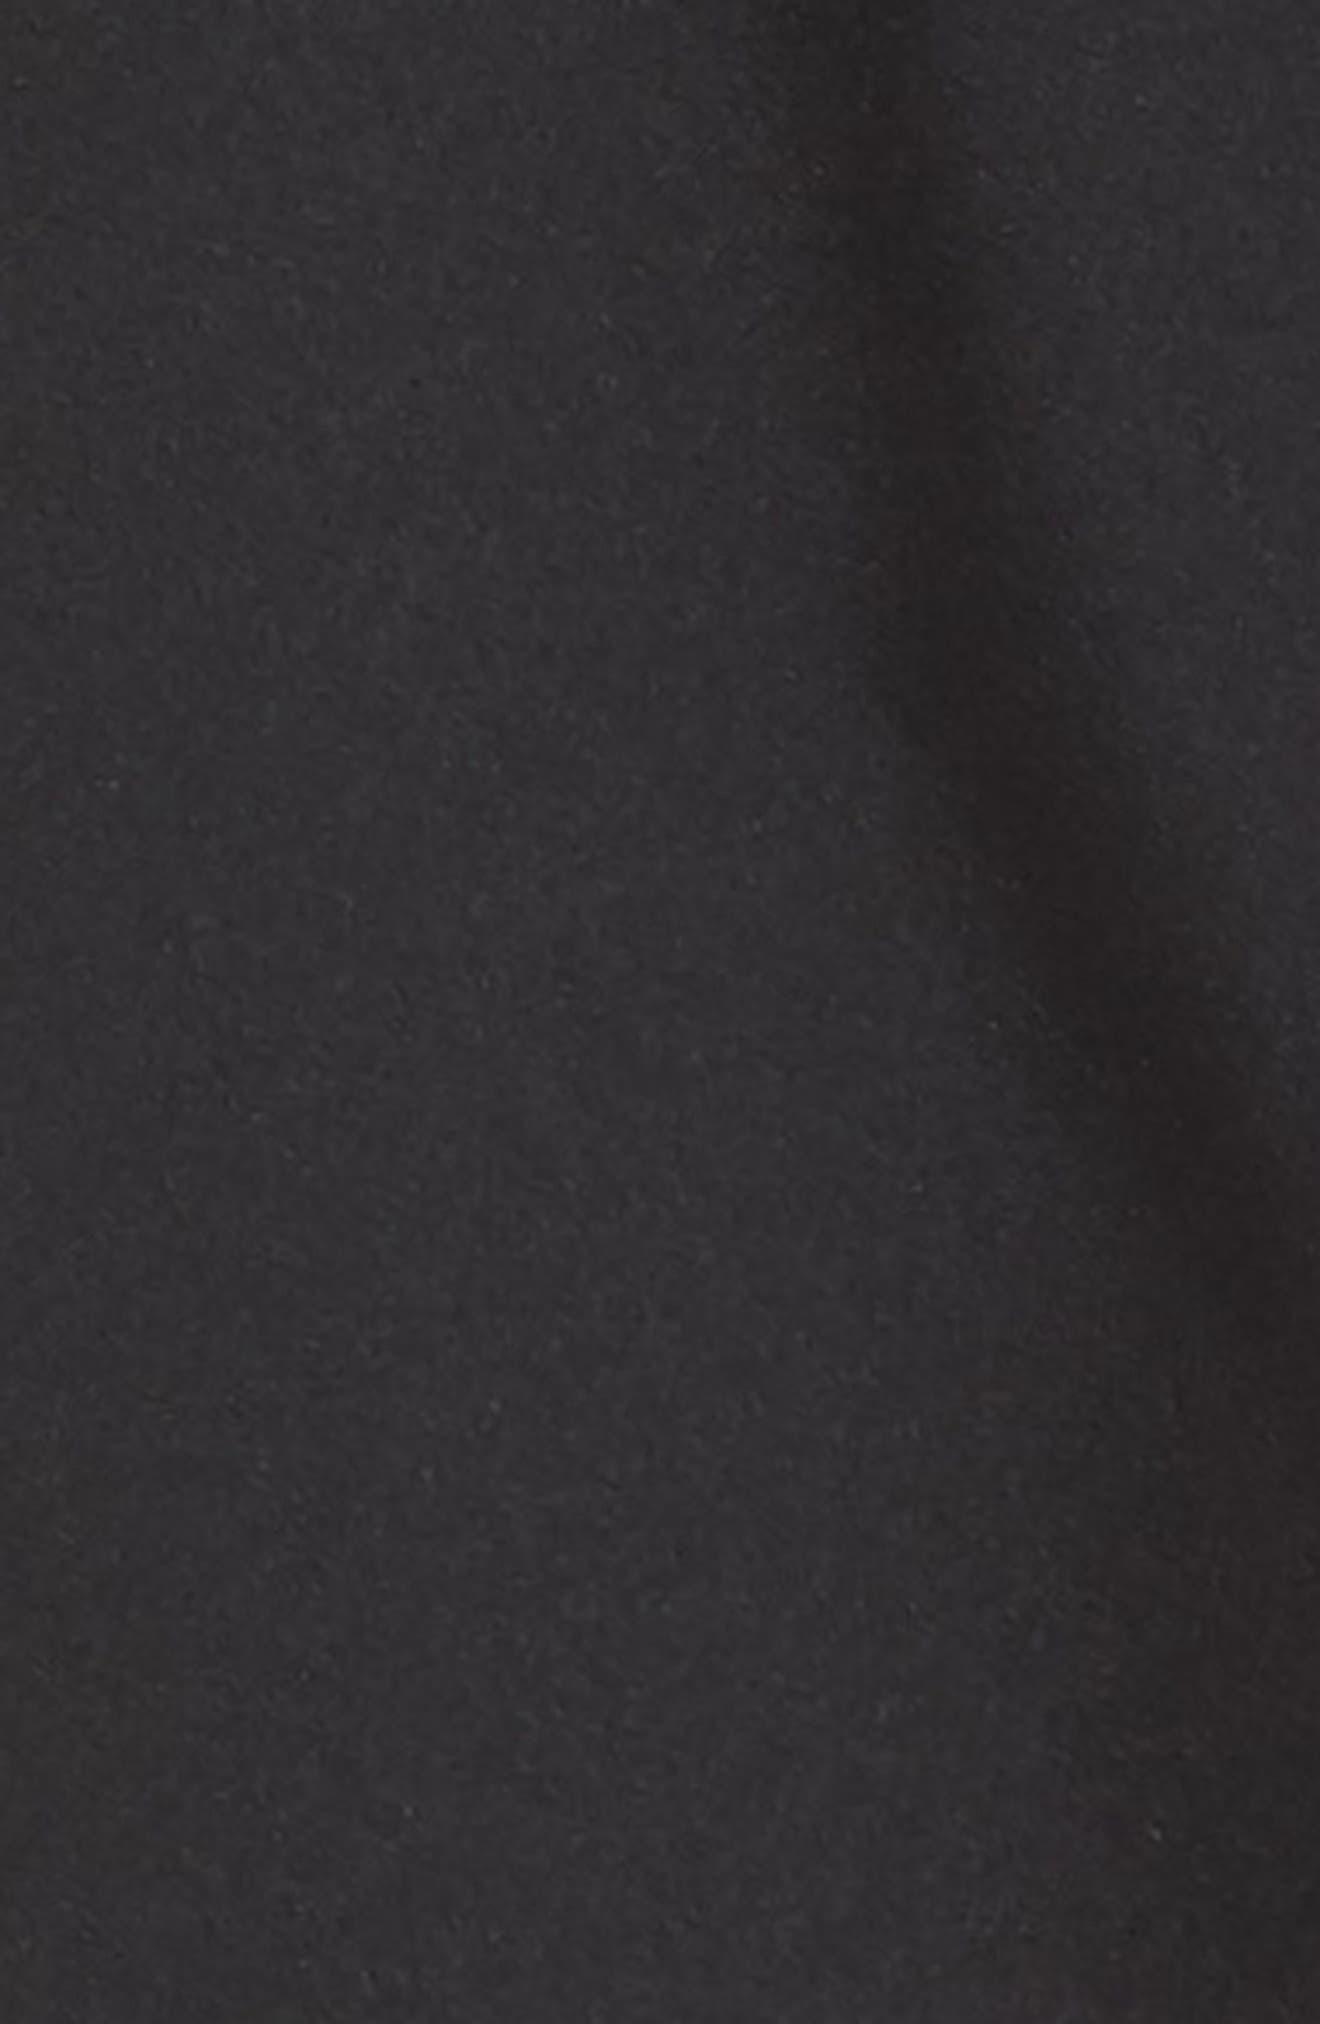 Dry Eclipse Running Shorts,                             Alternate thumbnail 6, color,                             Black